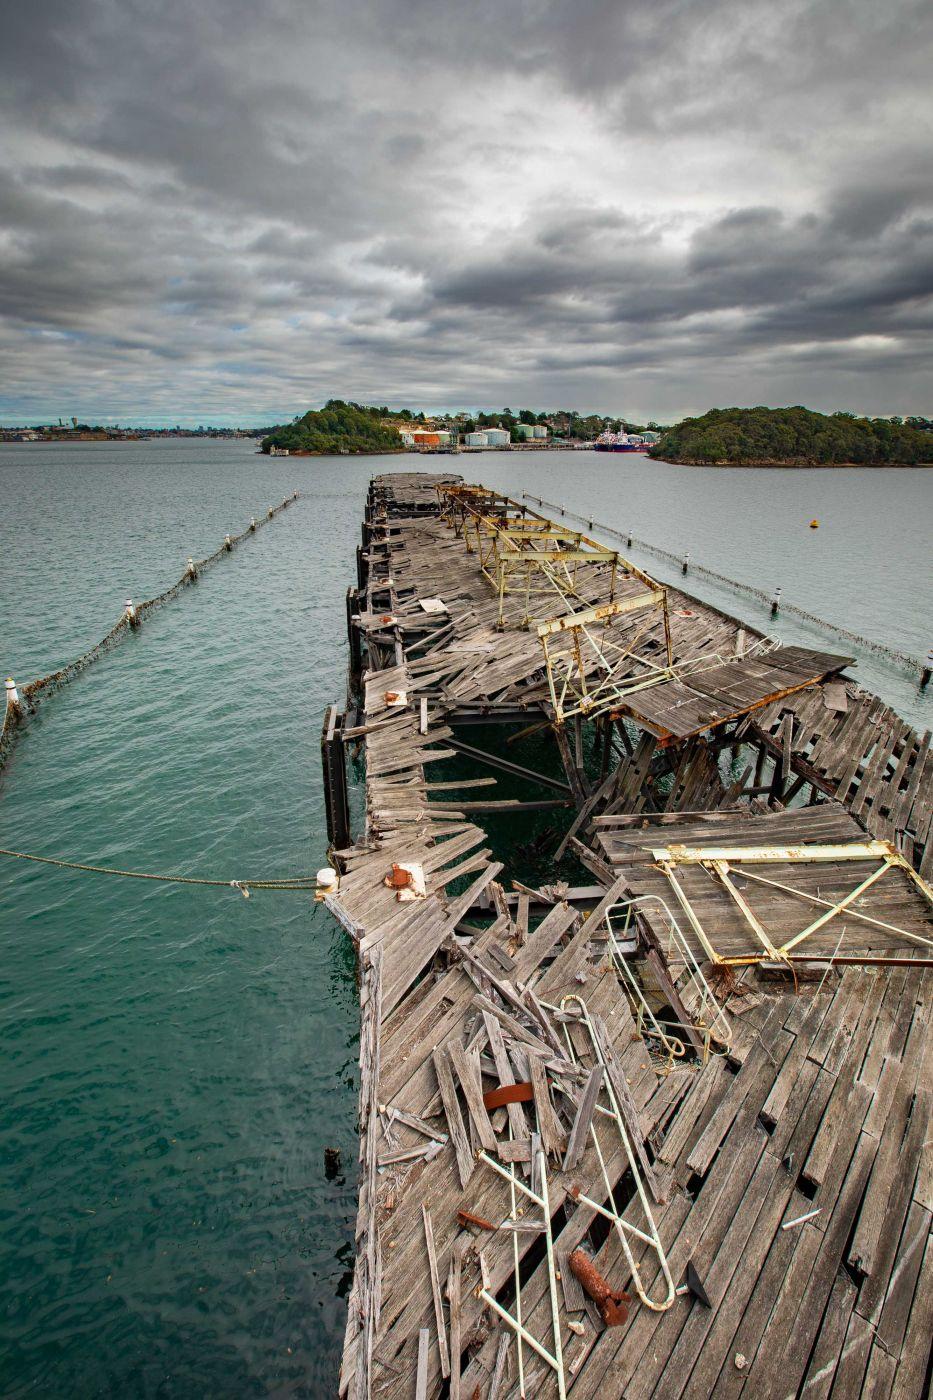 The Coal Loader Wharf Waverton Sydney NSW, Australia